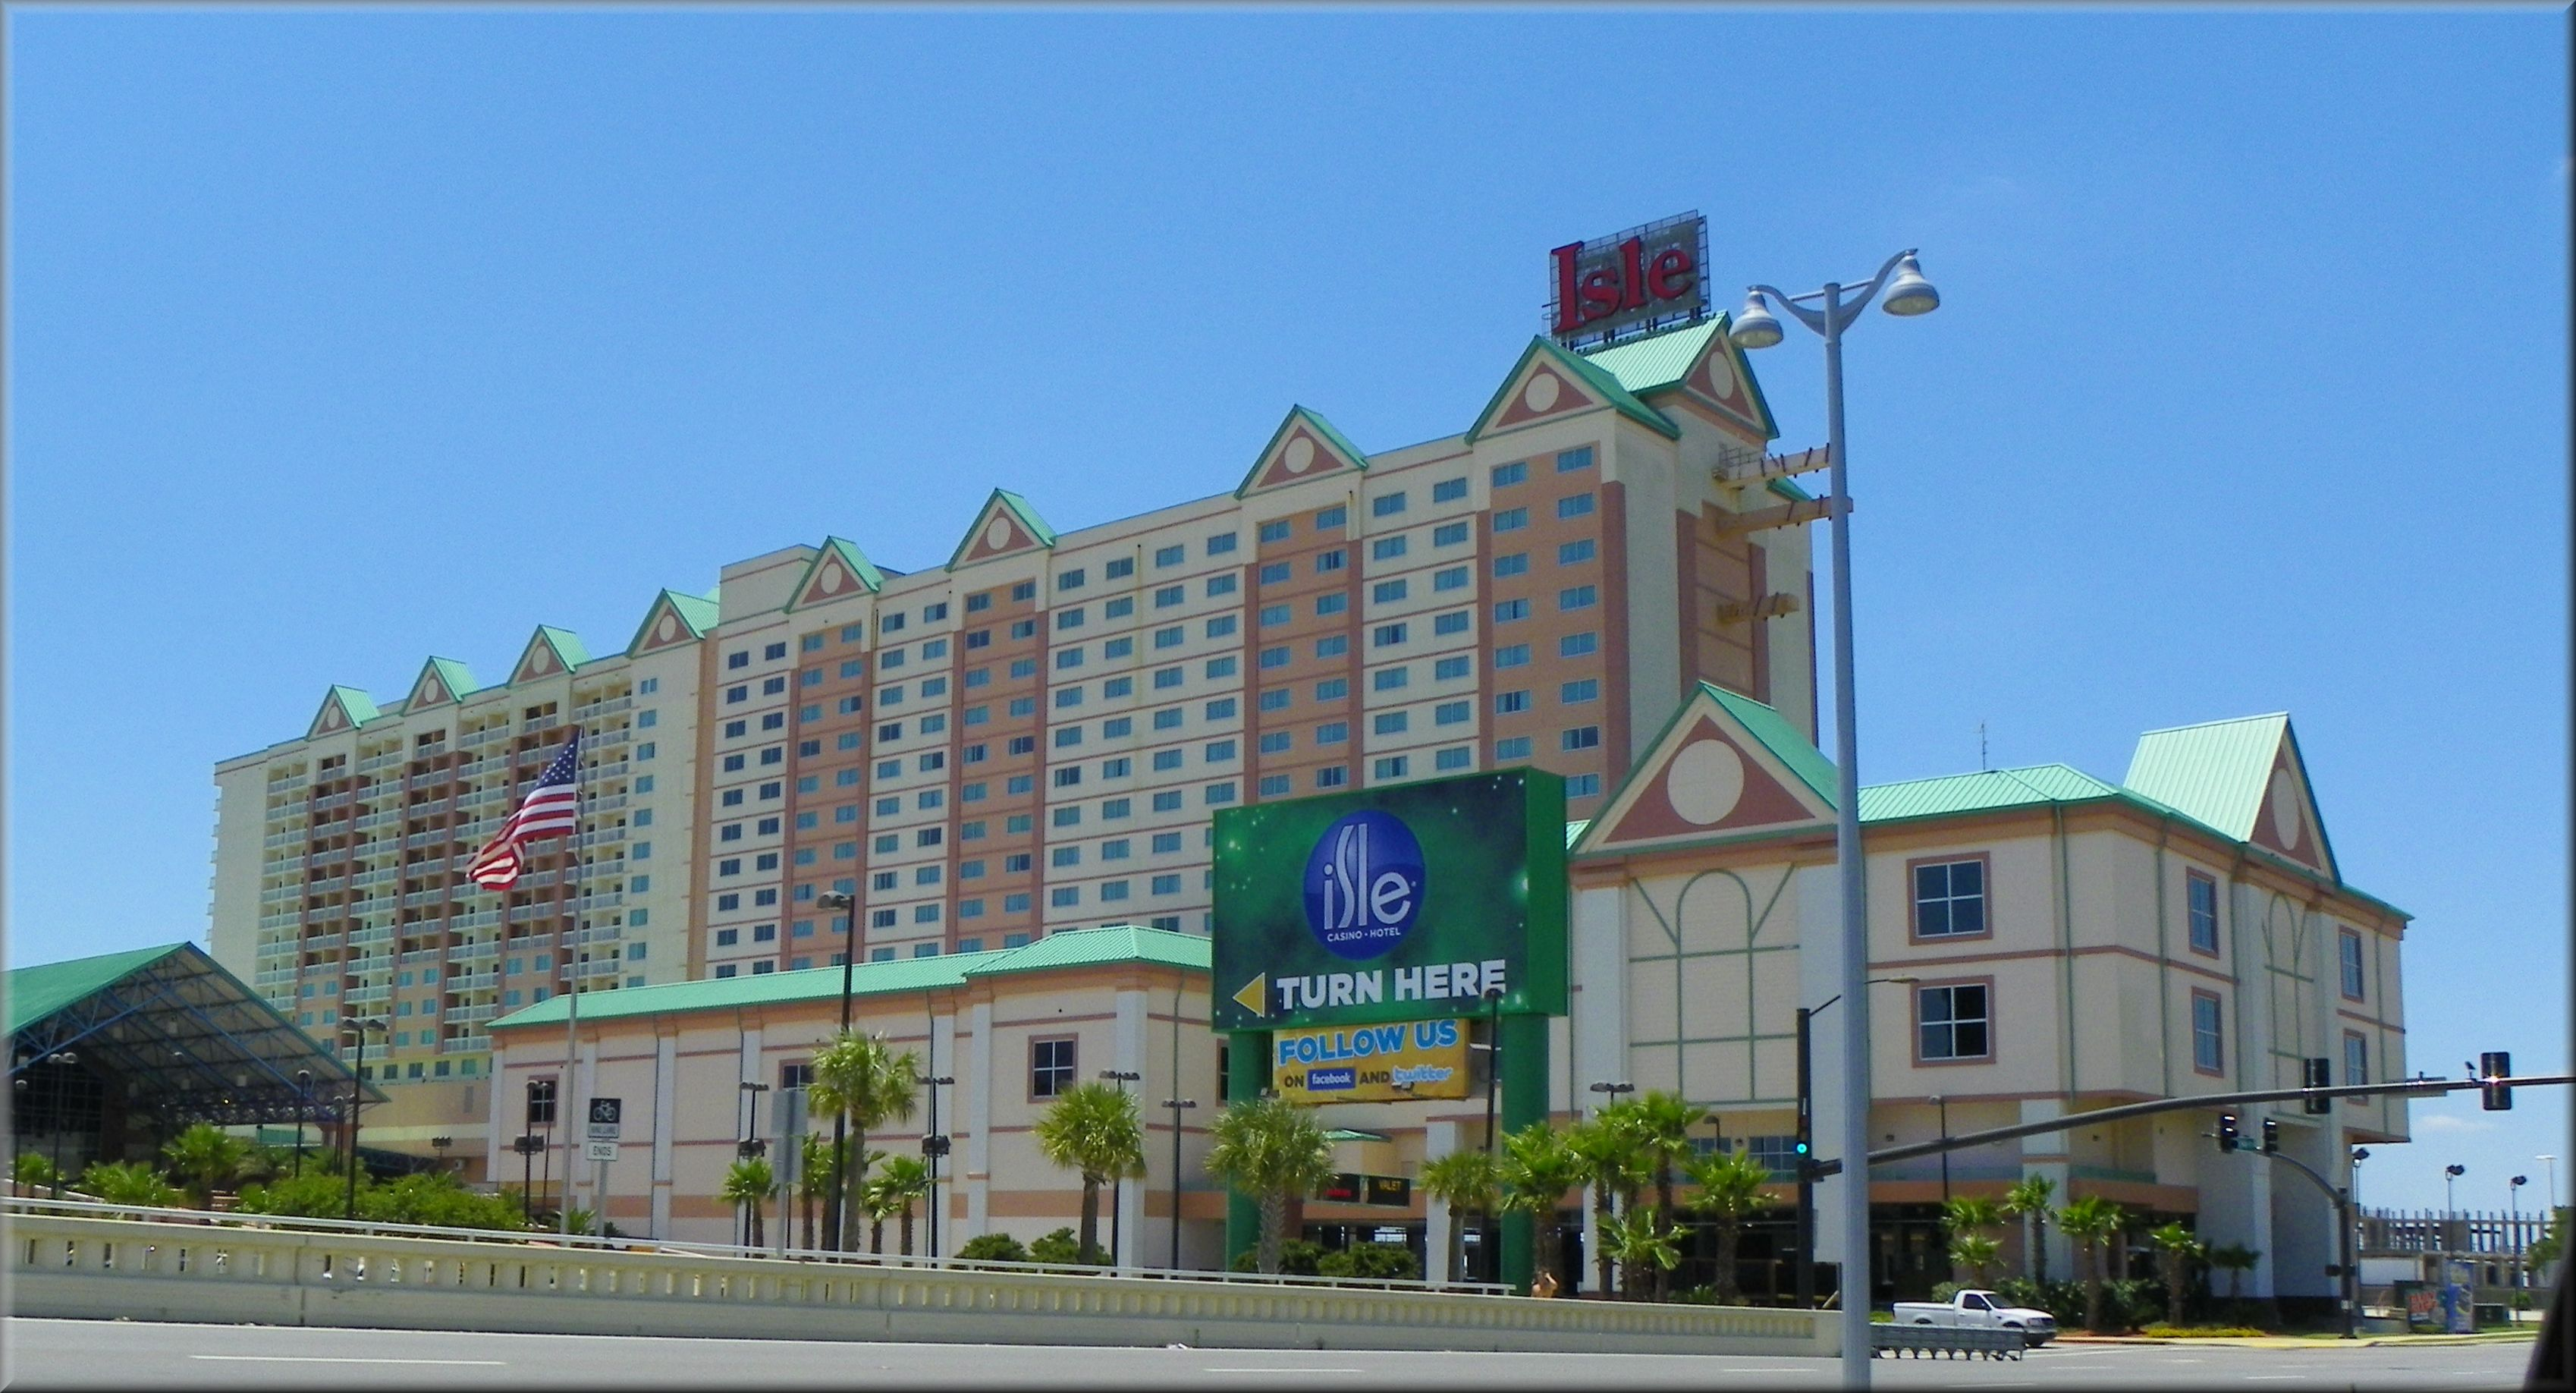 Ms casino deals